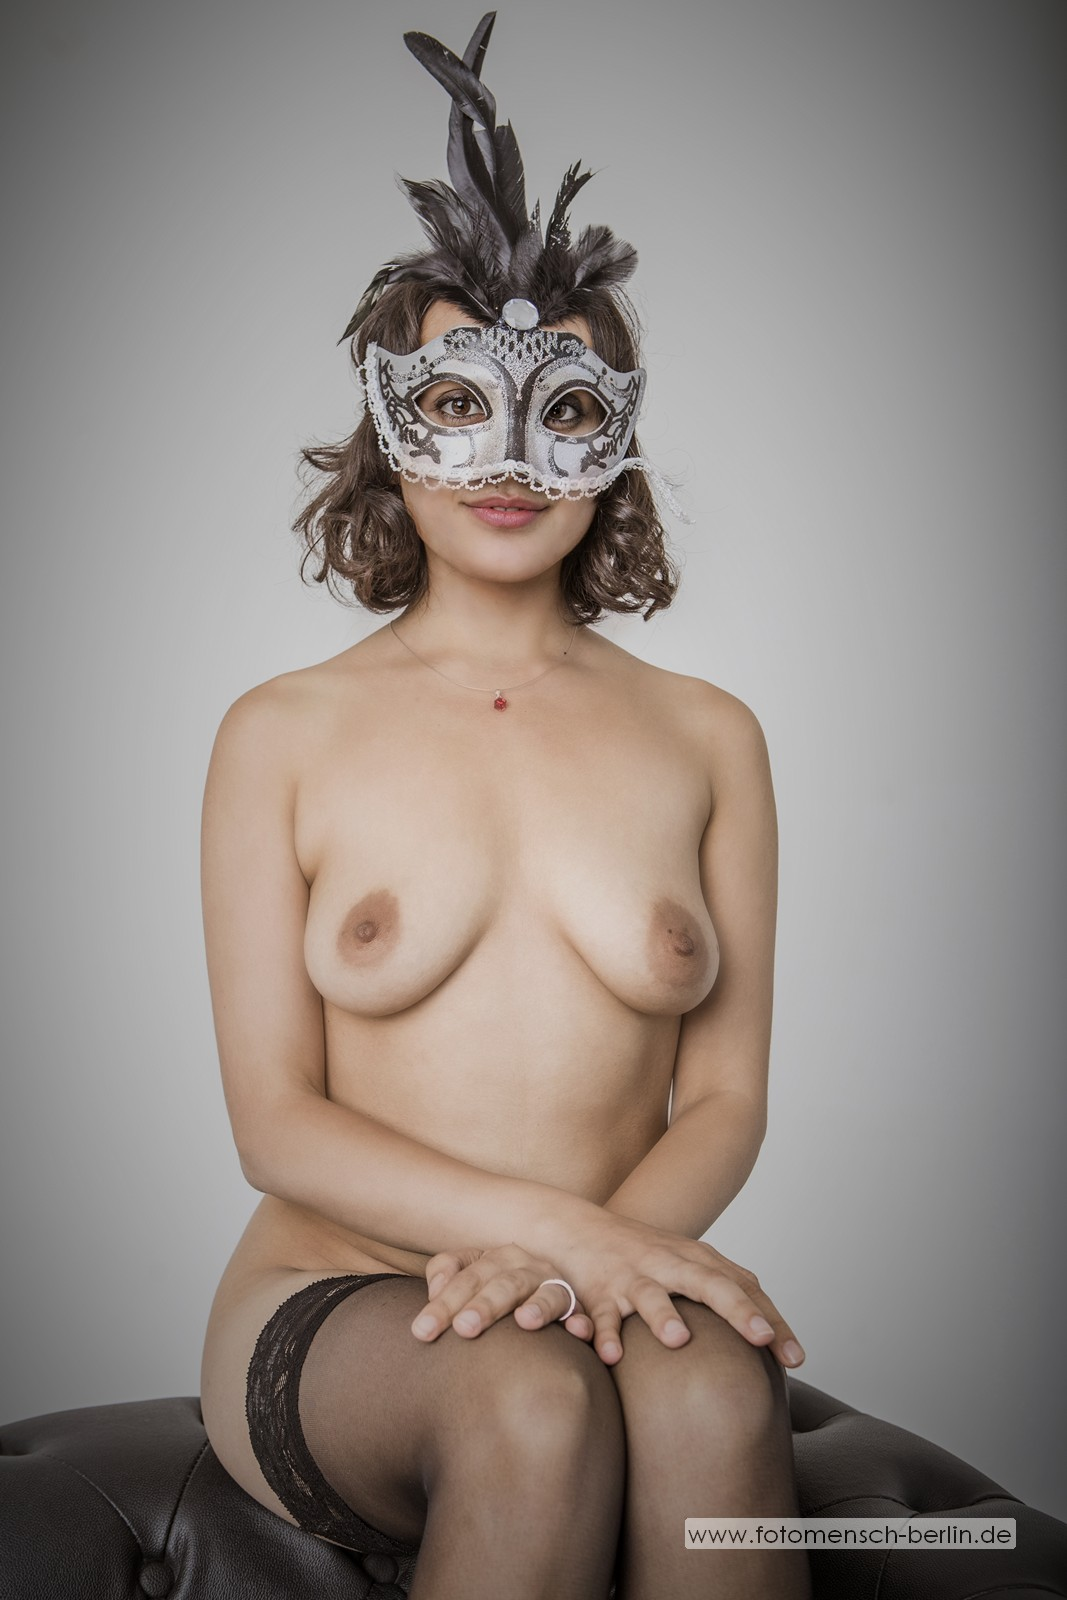 Yasmeena mit Maske